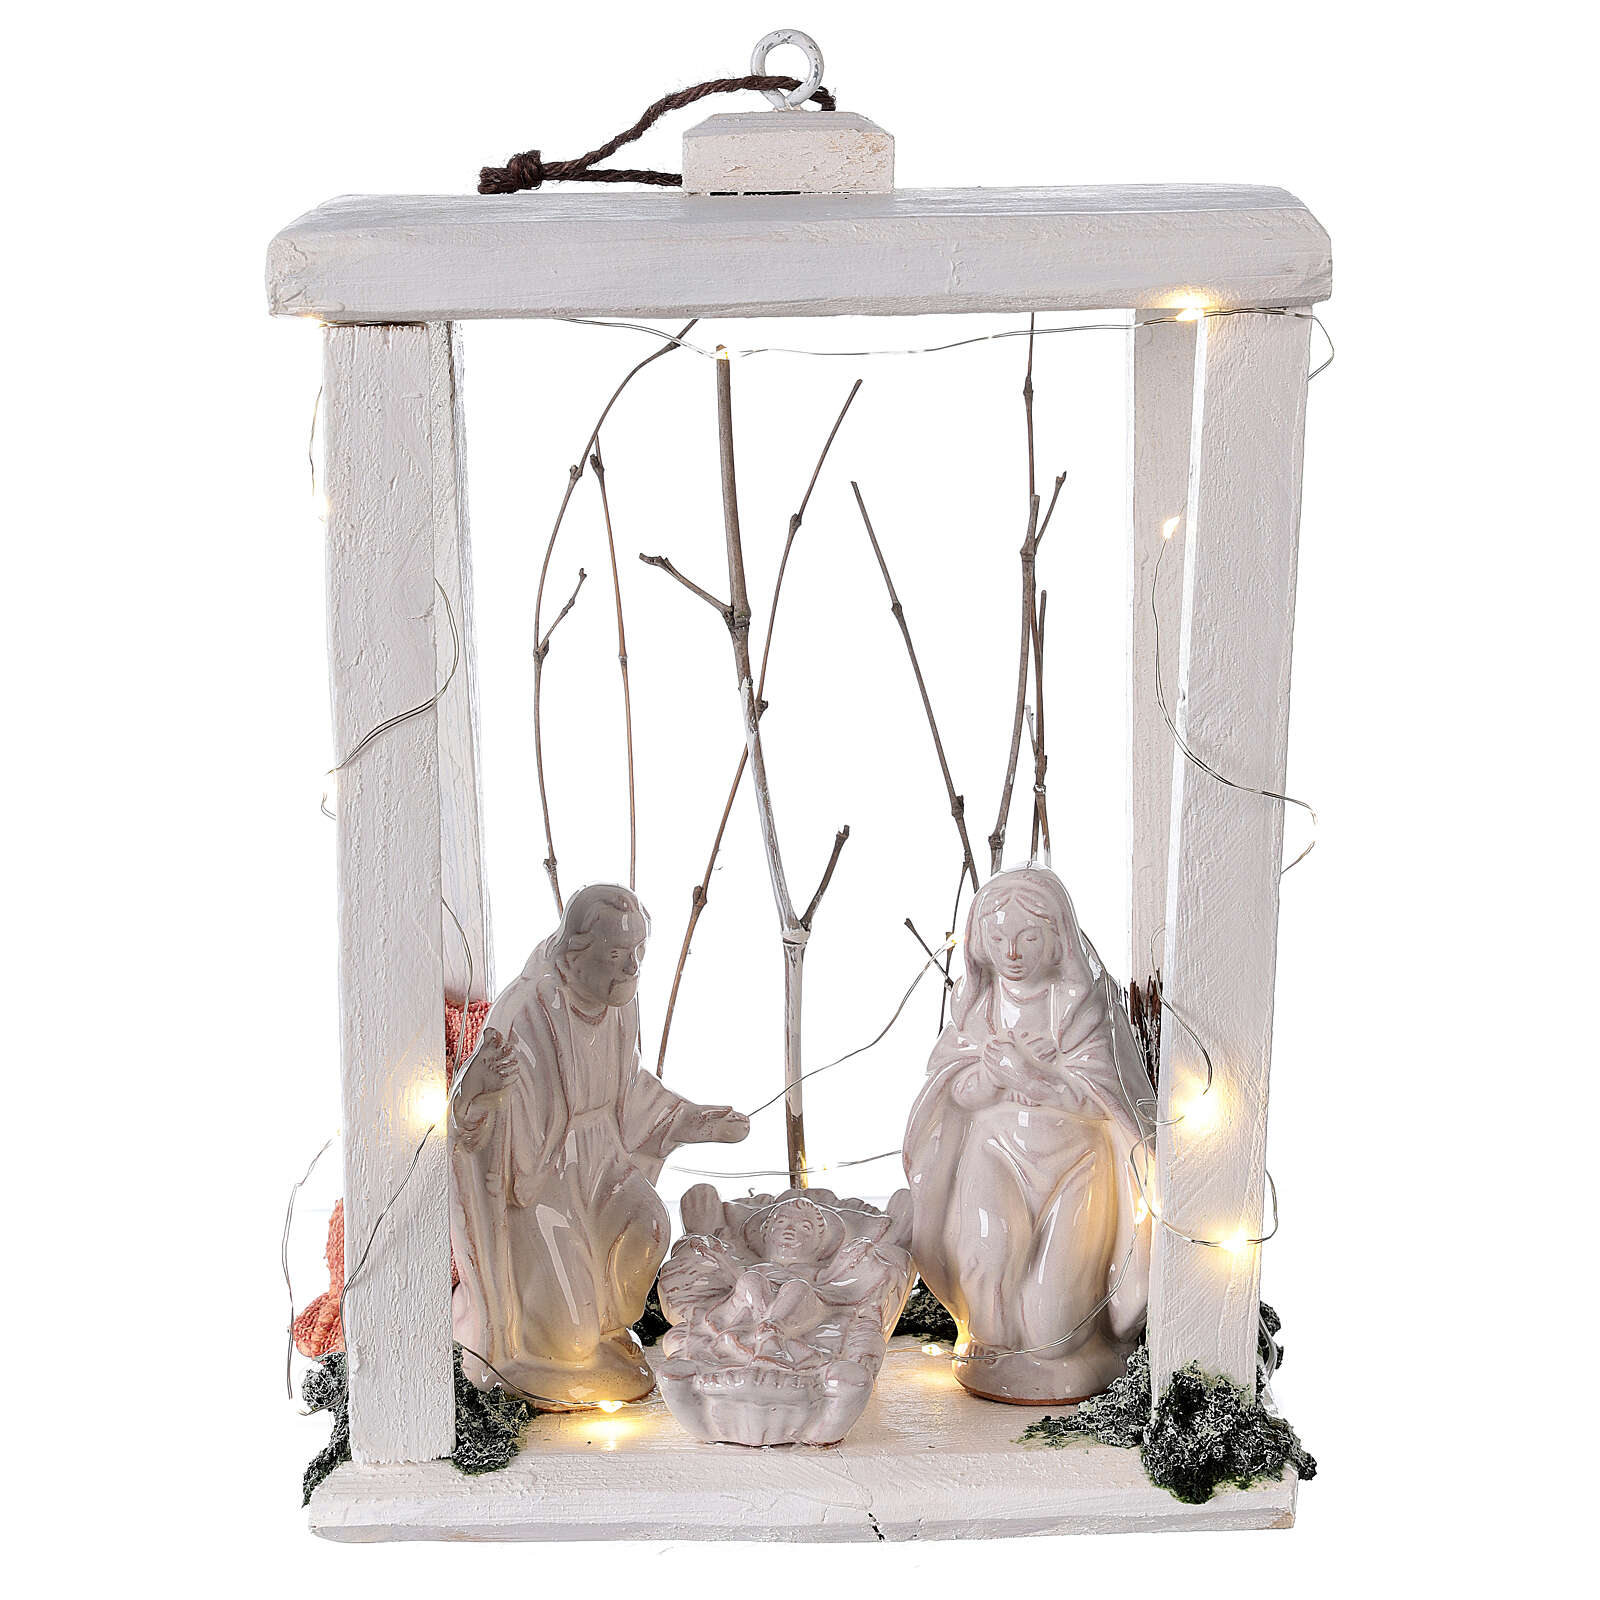 Linterna madera estatuas terracota blanca Deruta 30x22x18 20 luces microled 4